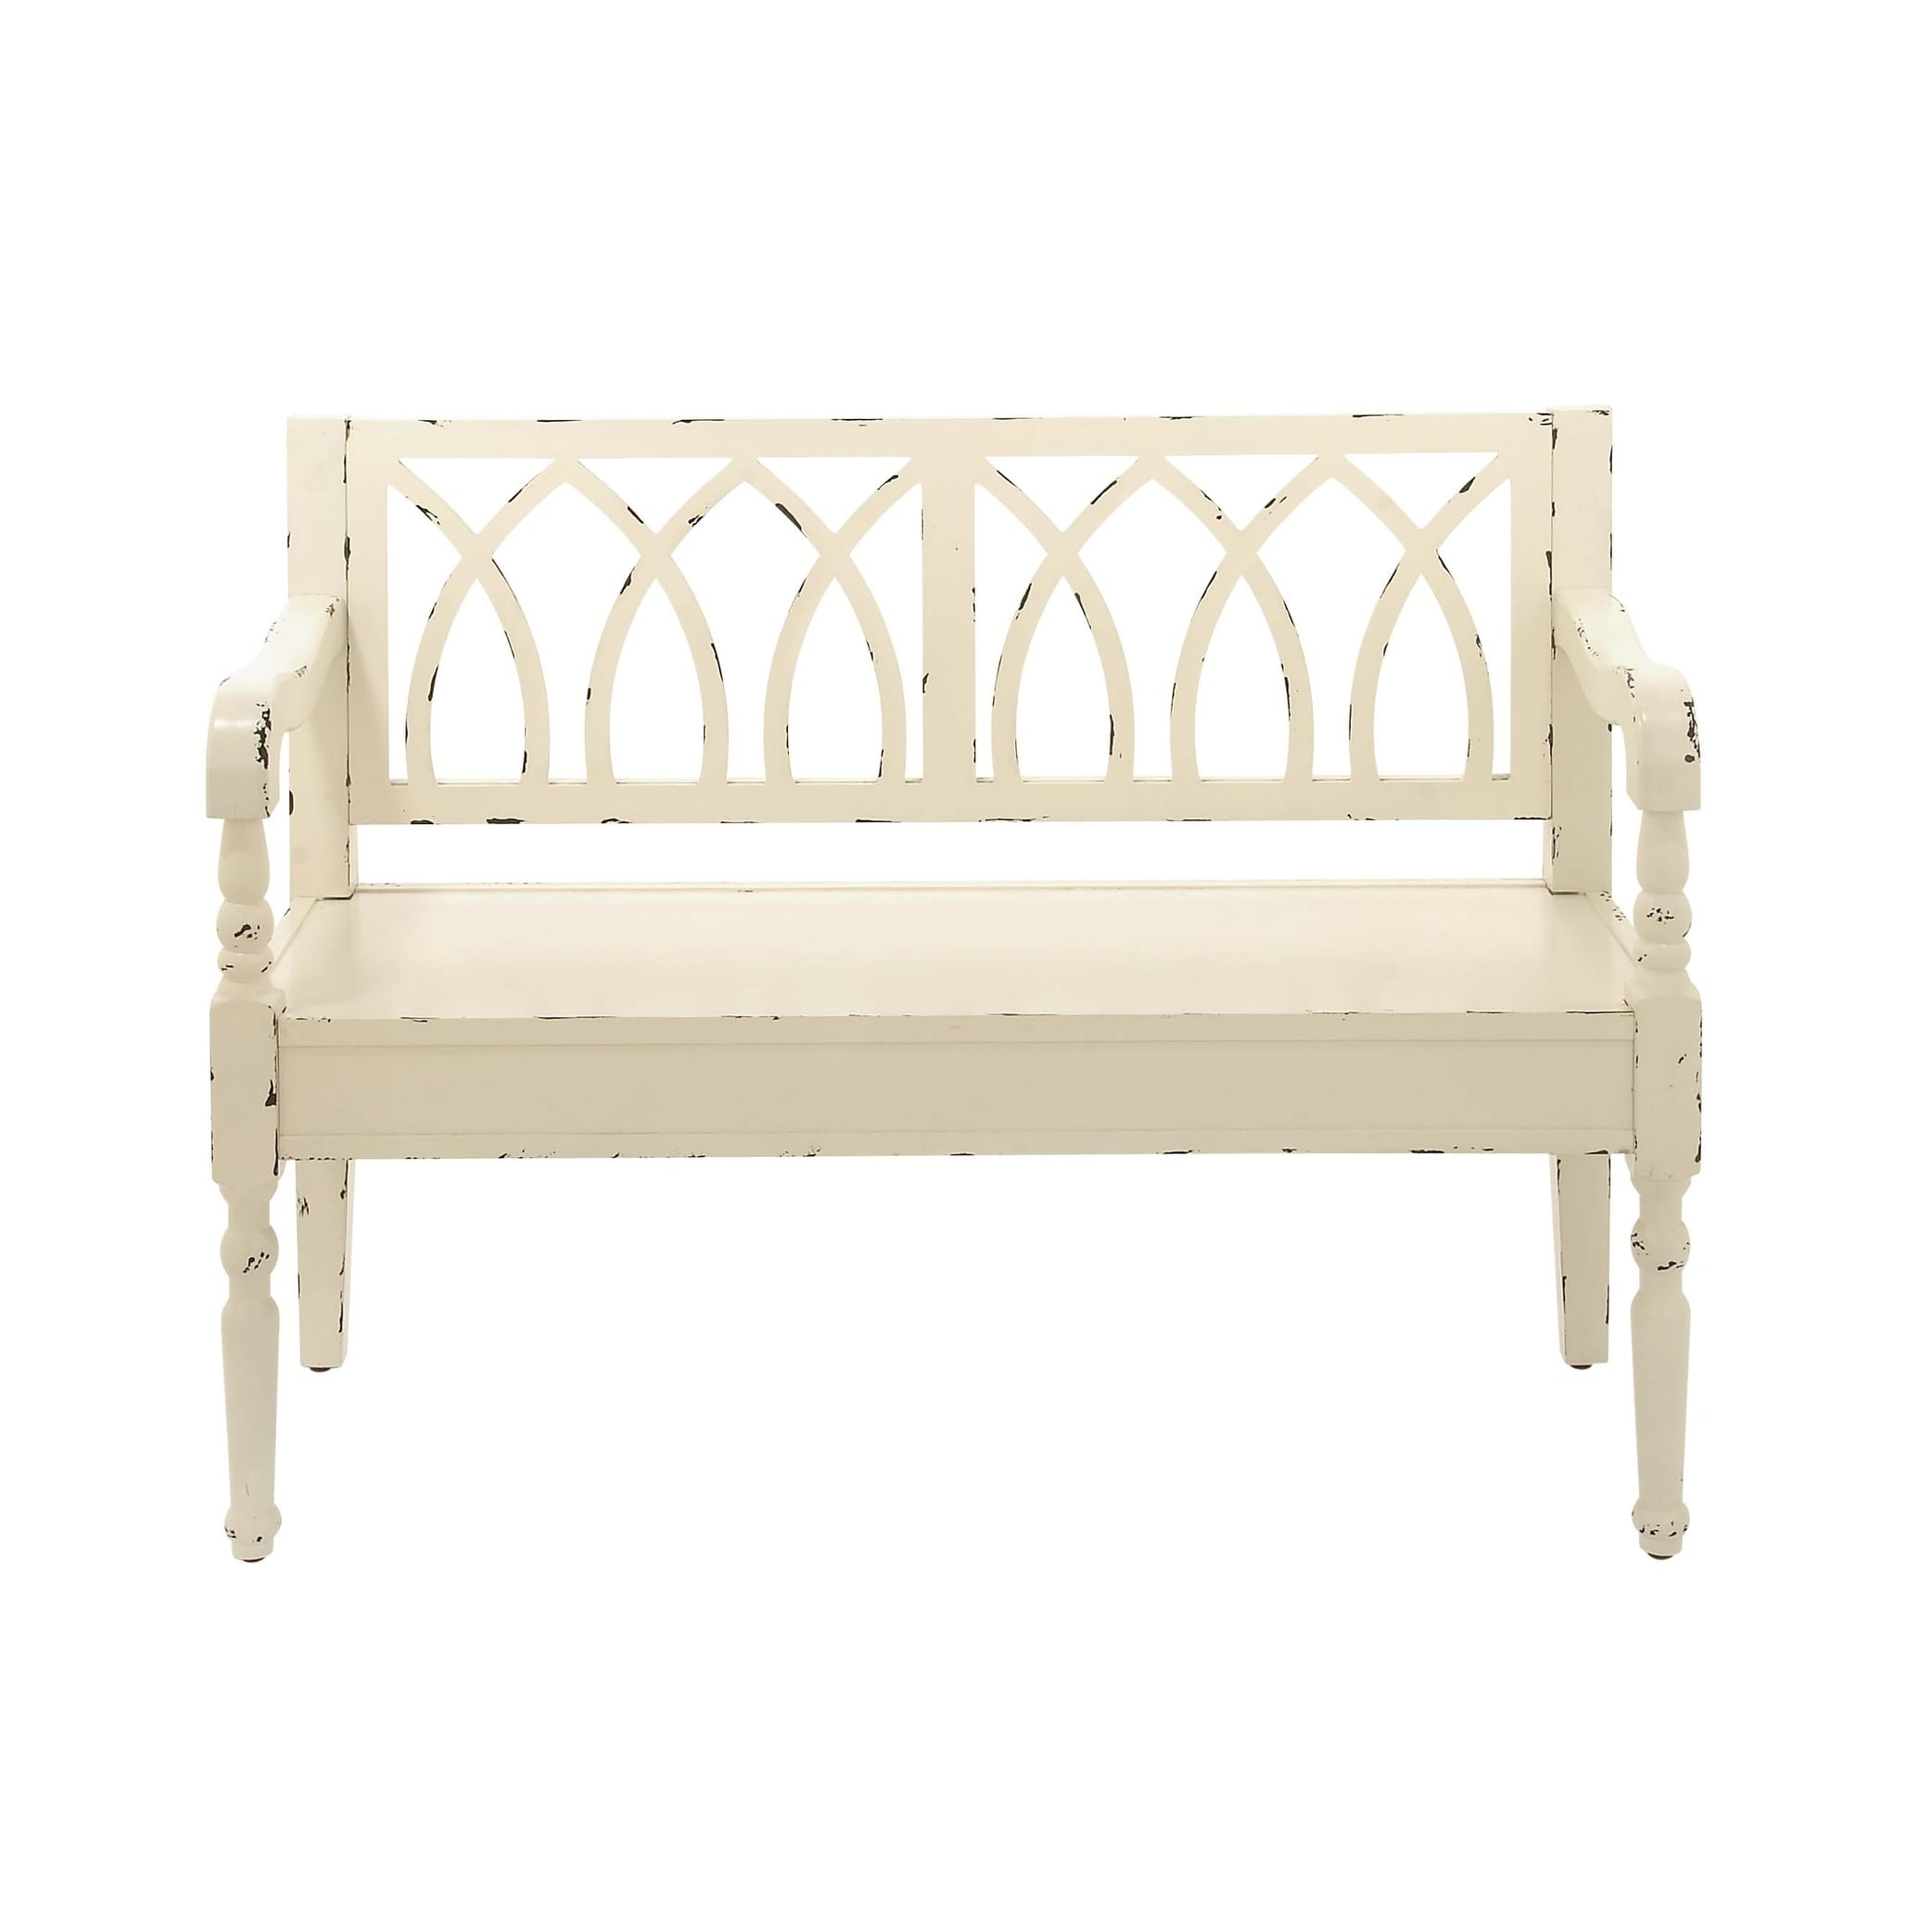 Farmhouse Distressed White Wooden Bench By Studio 350  Free